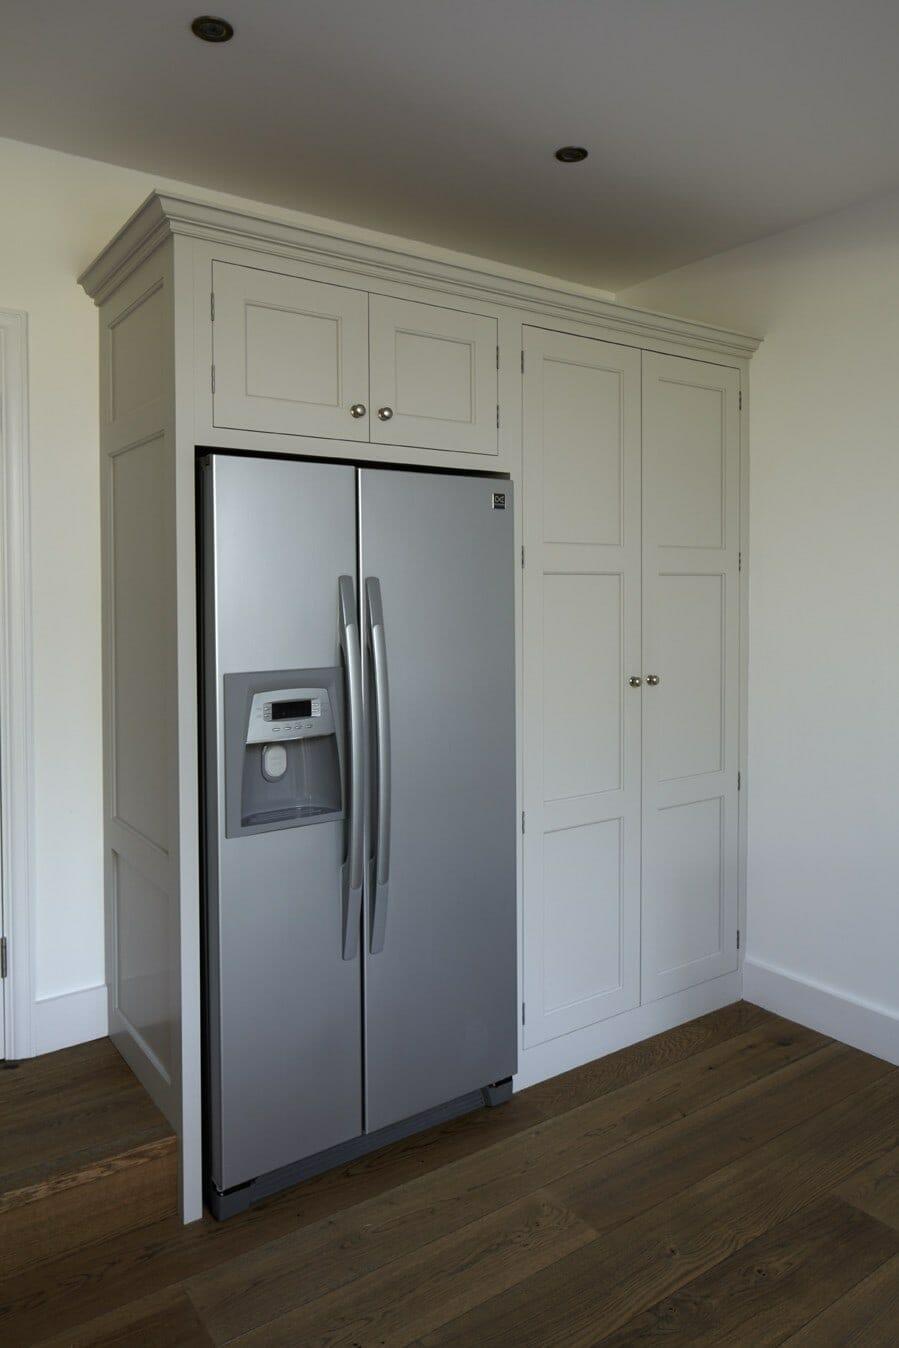 free standing kitchen island organization tips hinchley wood, surrey traditional - higham furniture